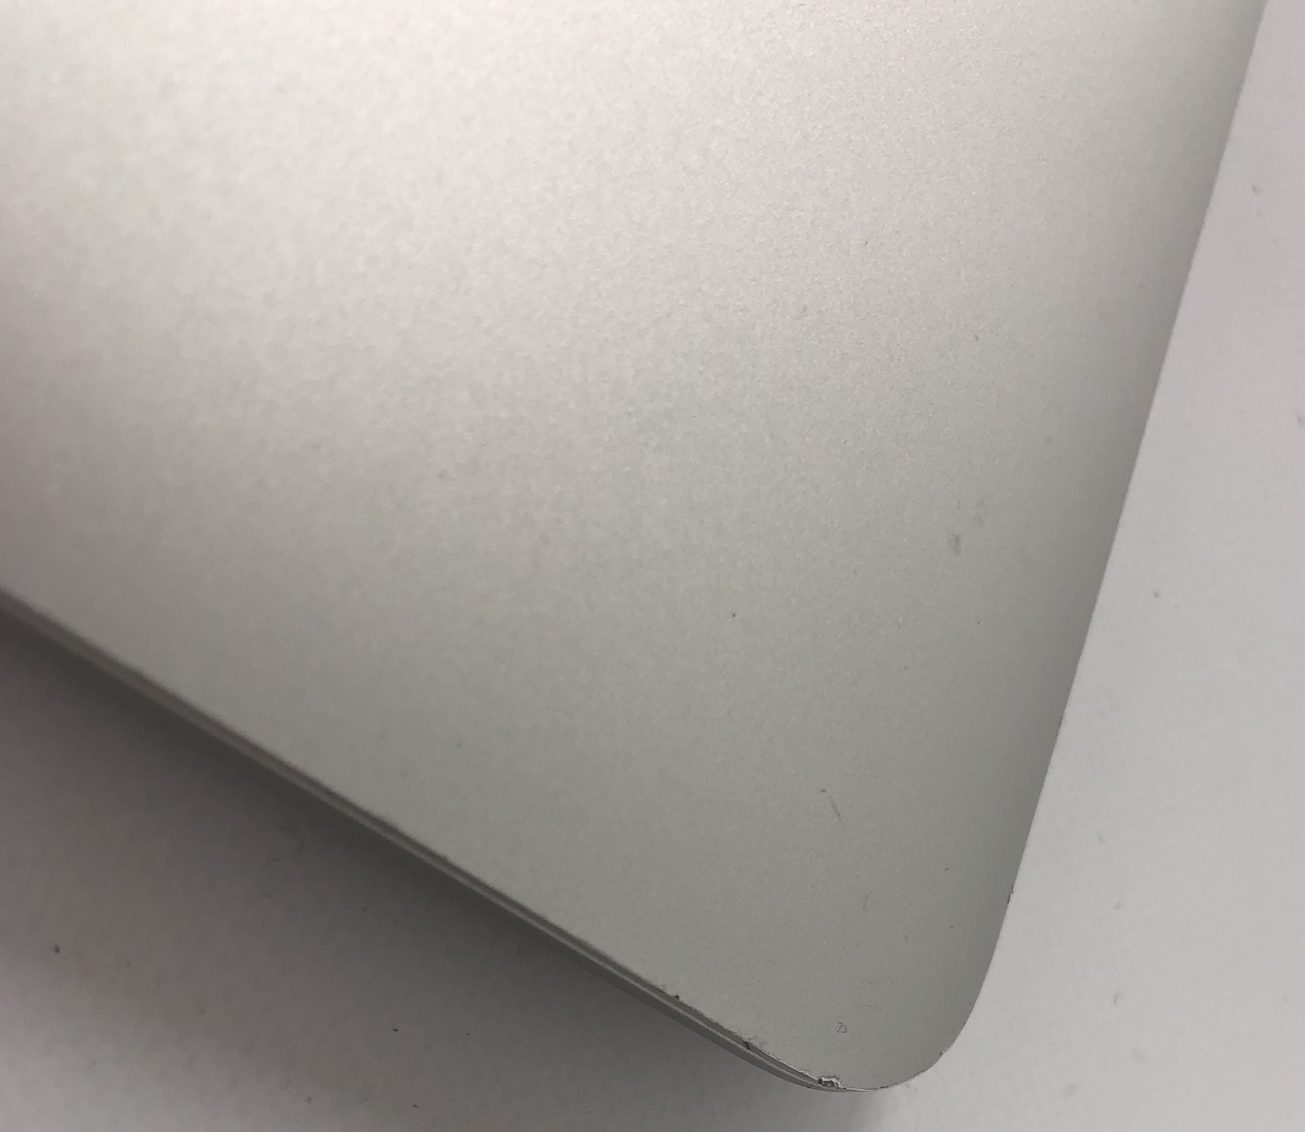 "MacBook Air 13"" Early 2015 (Intel Core i5 1.6 GHz 8 GB RAM 256 GB SSD), Intel Core i5 1.6 GHz, 8 GB RAM, 256 GB SSD, image 4"